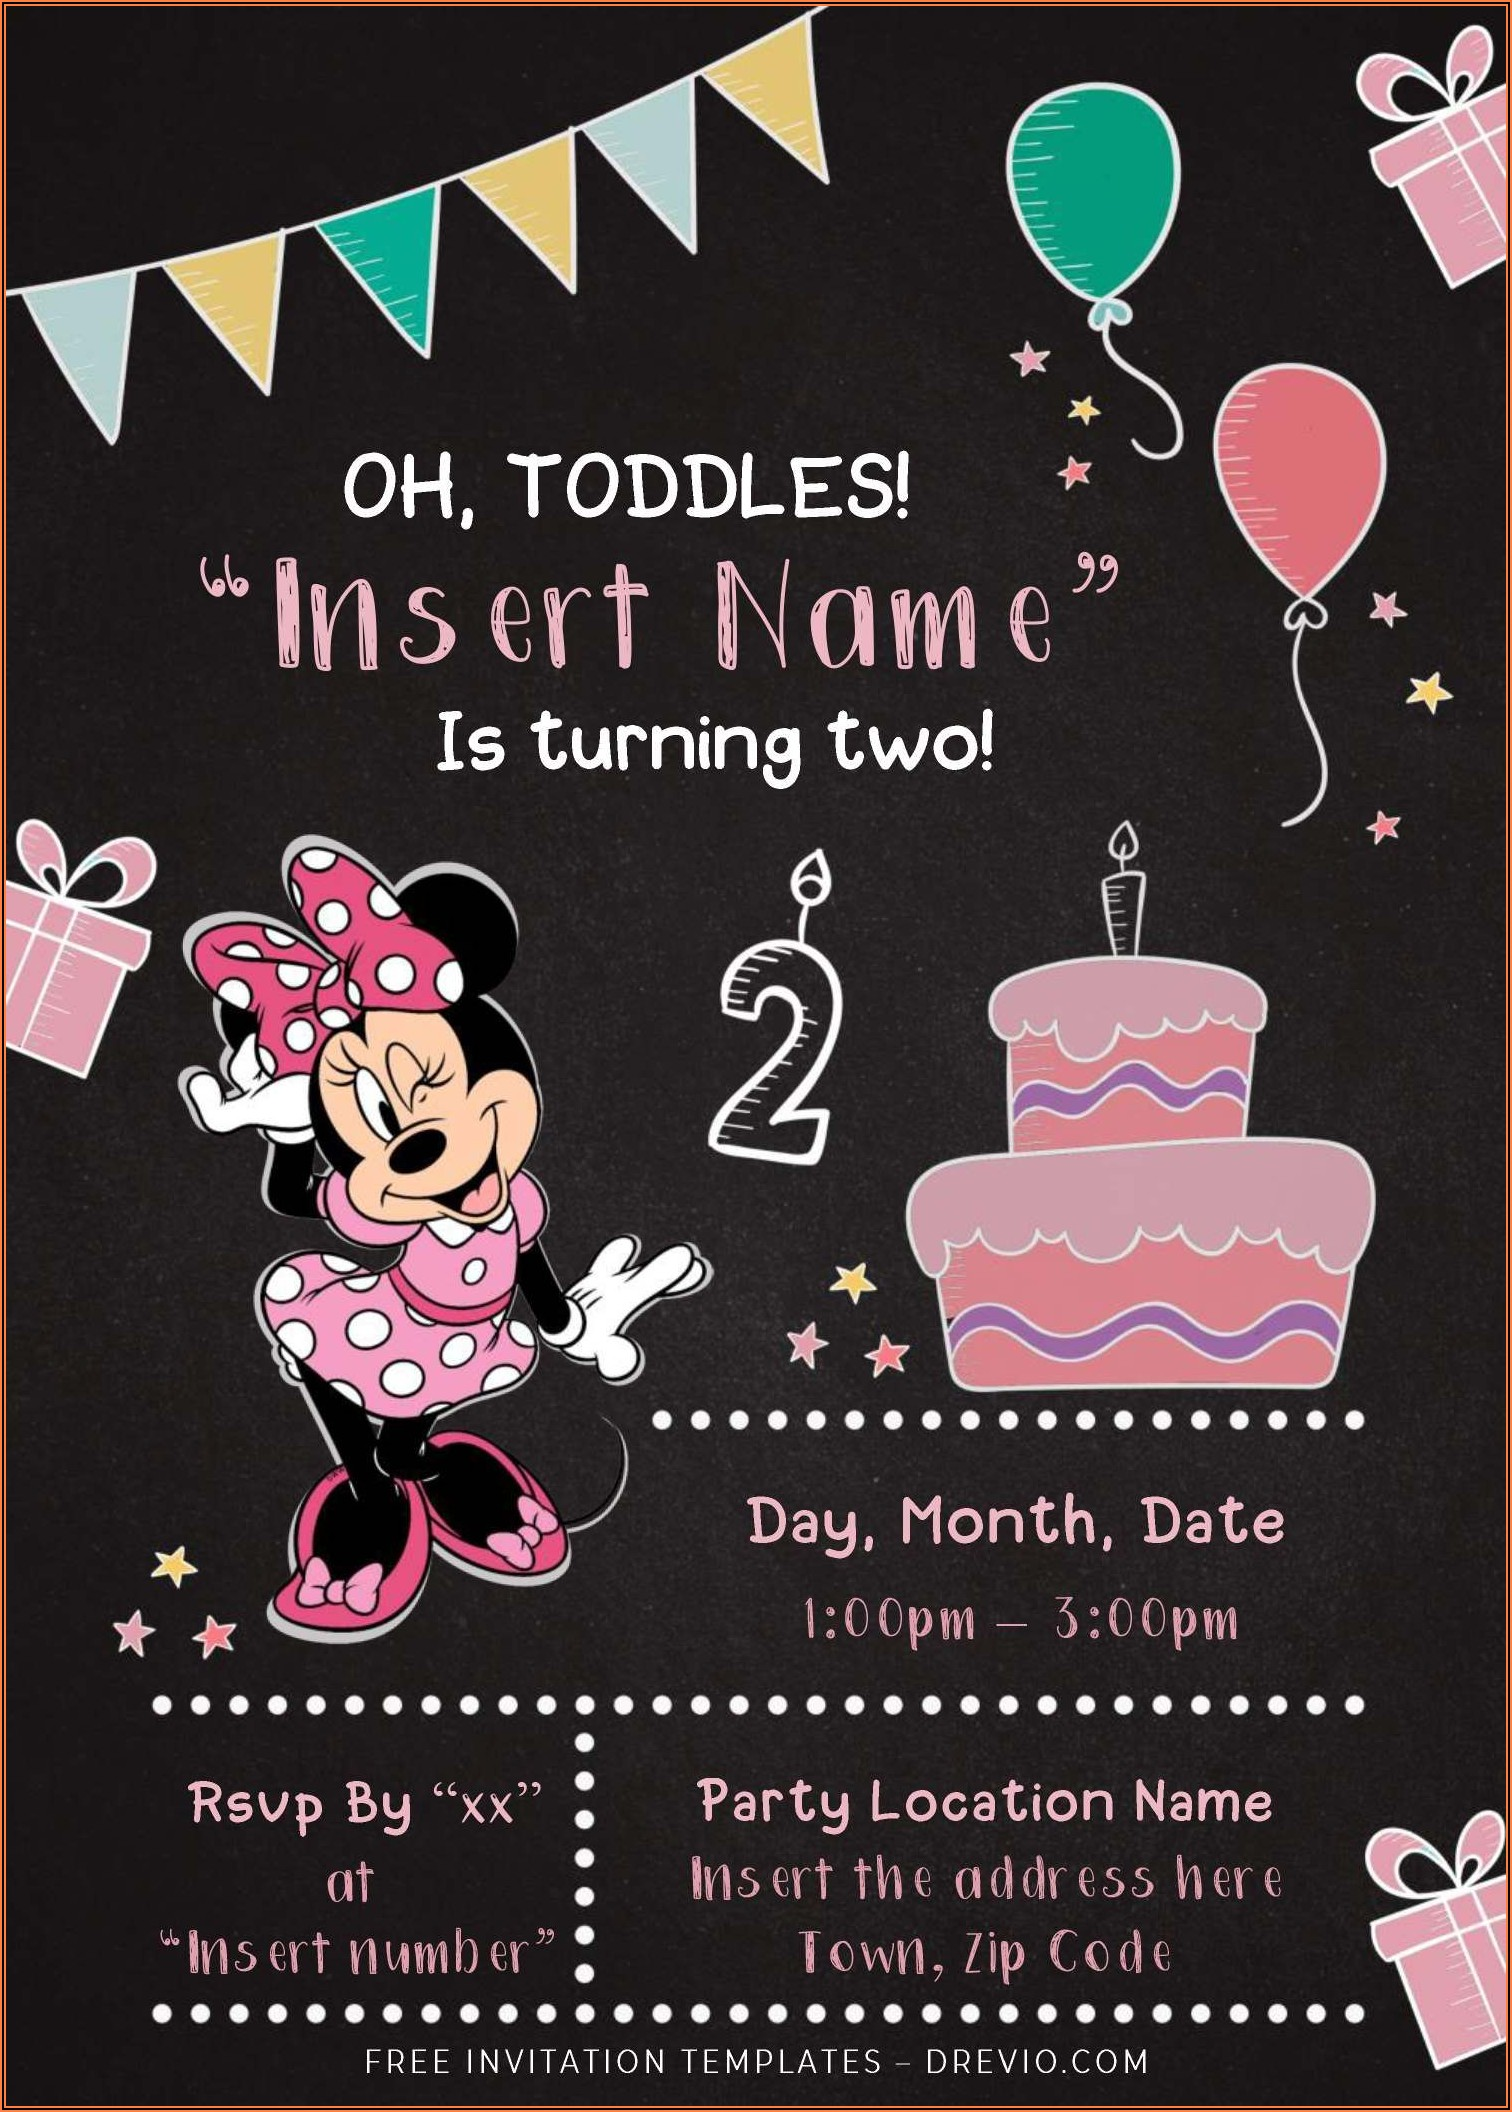 Free Birthday Invitation Templates For Word